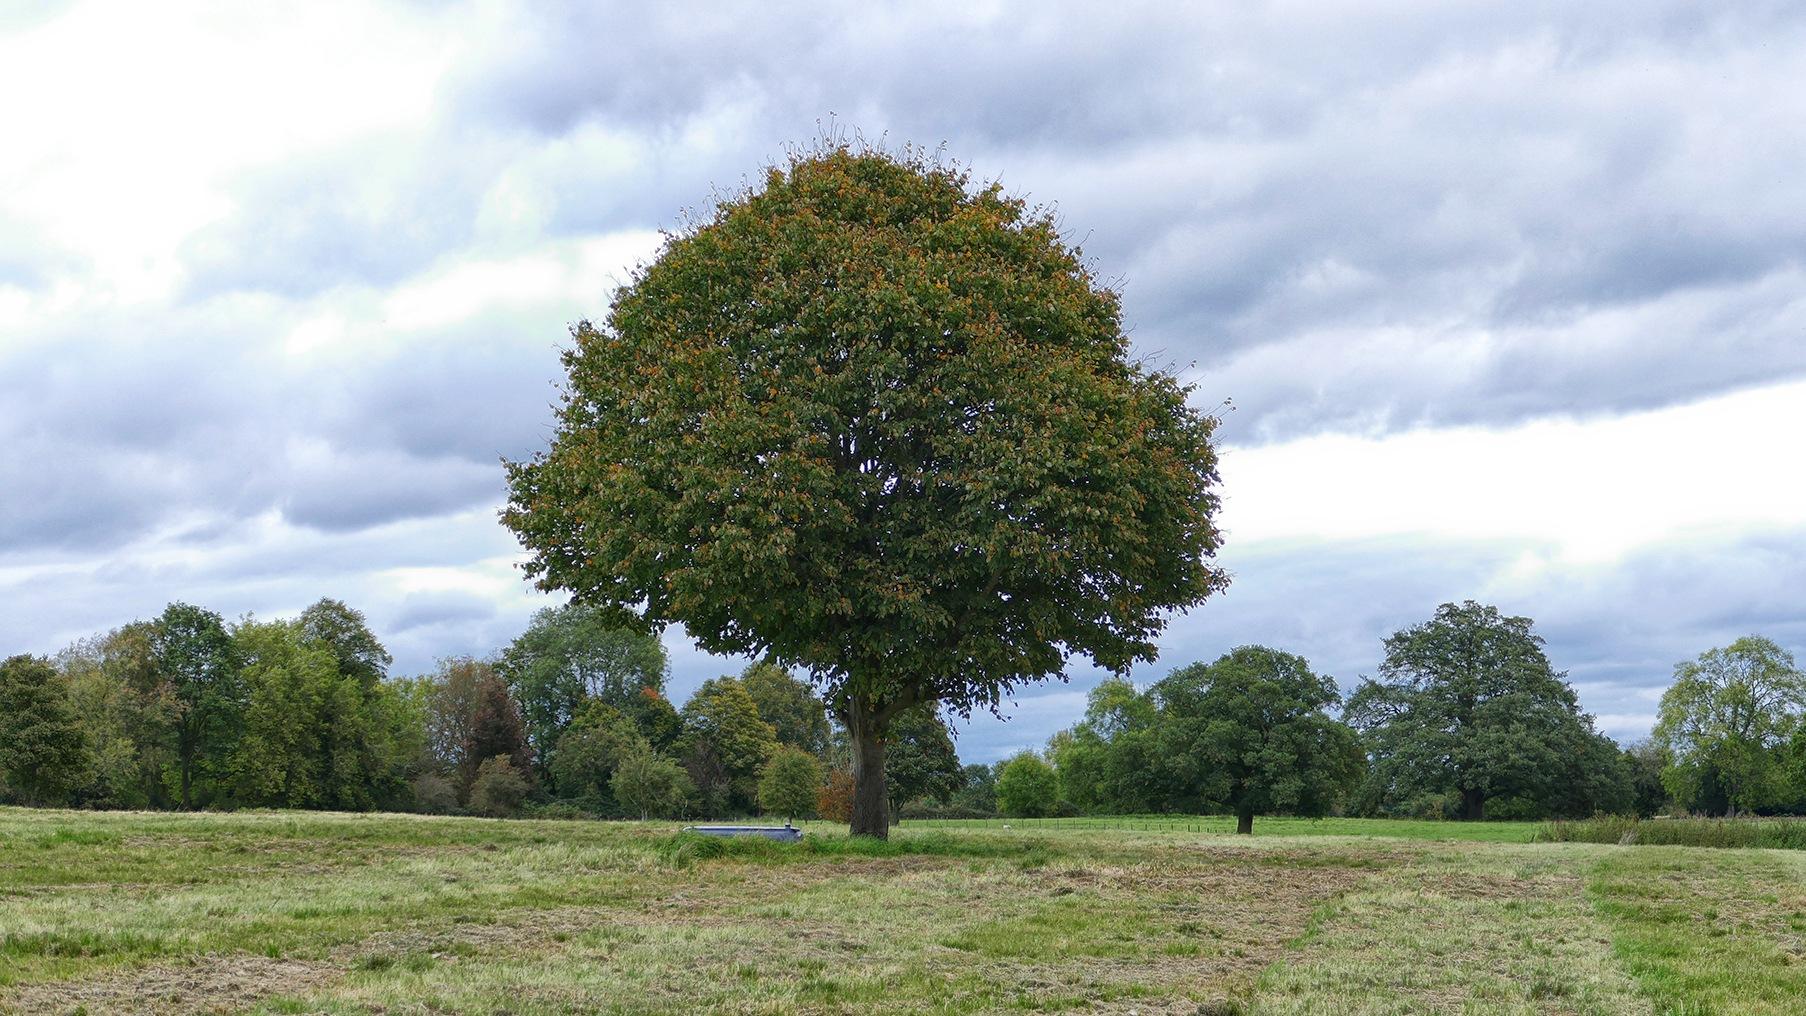 Bromham tree by Steven Iodice